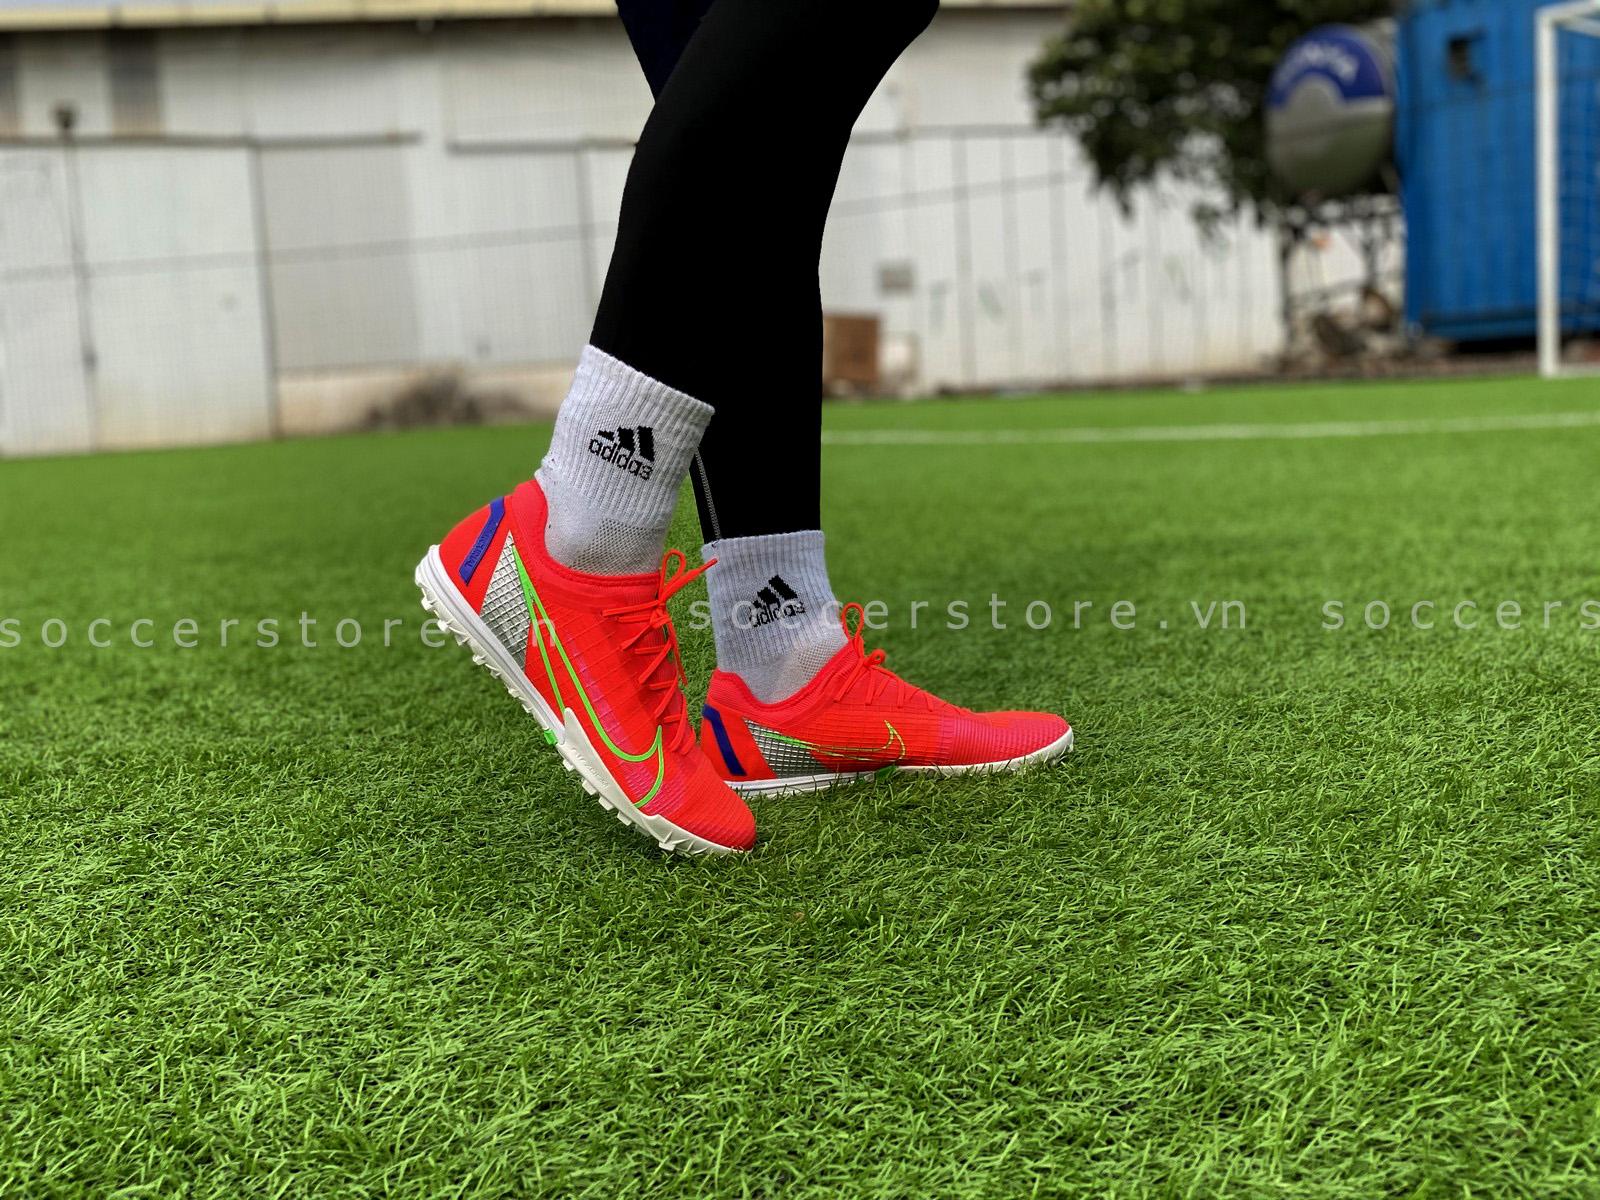 Nike Mercurial Vapor 14 Pro TF Spectrum - CV1001-600